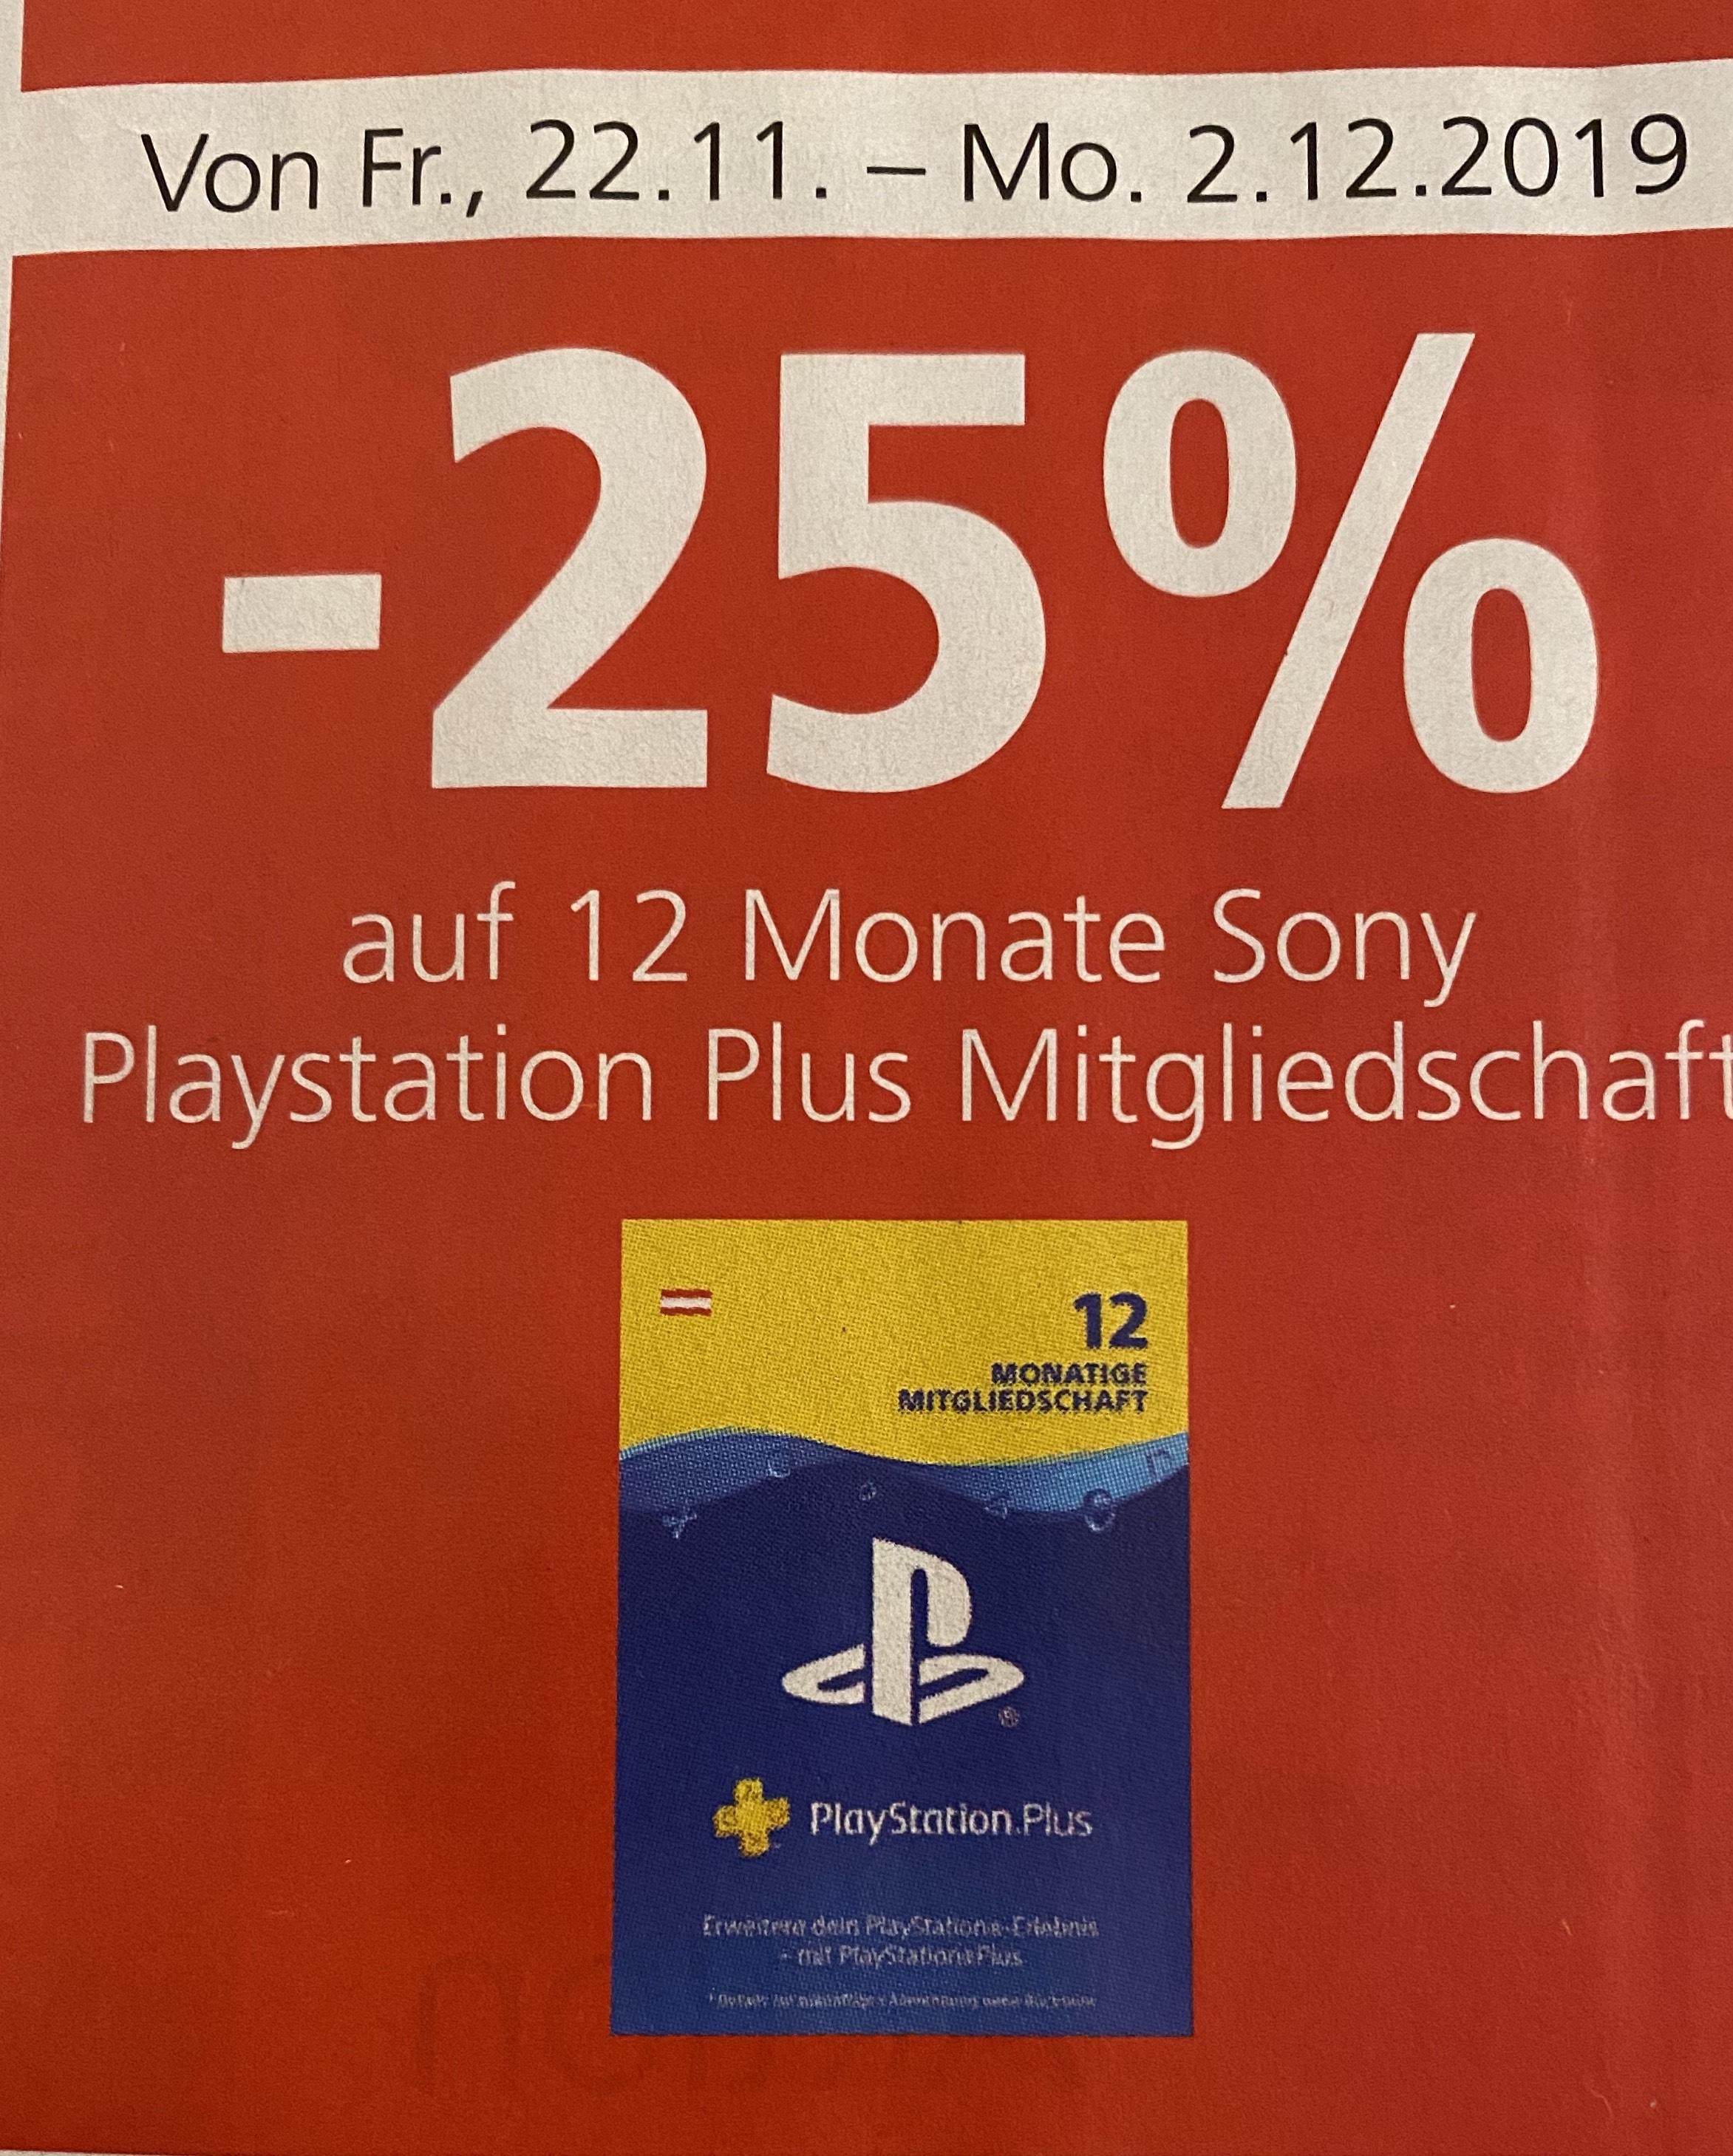 Spar: 12 Monate Sony Playstation Plus Mitgliedschaft